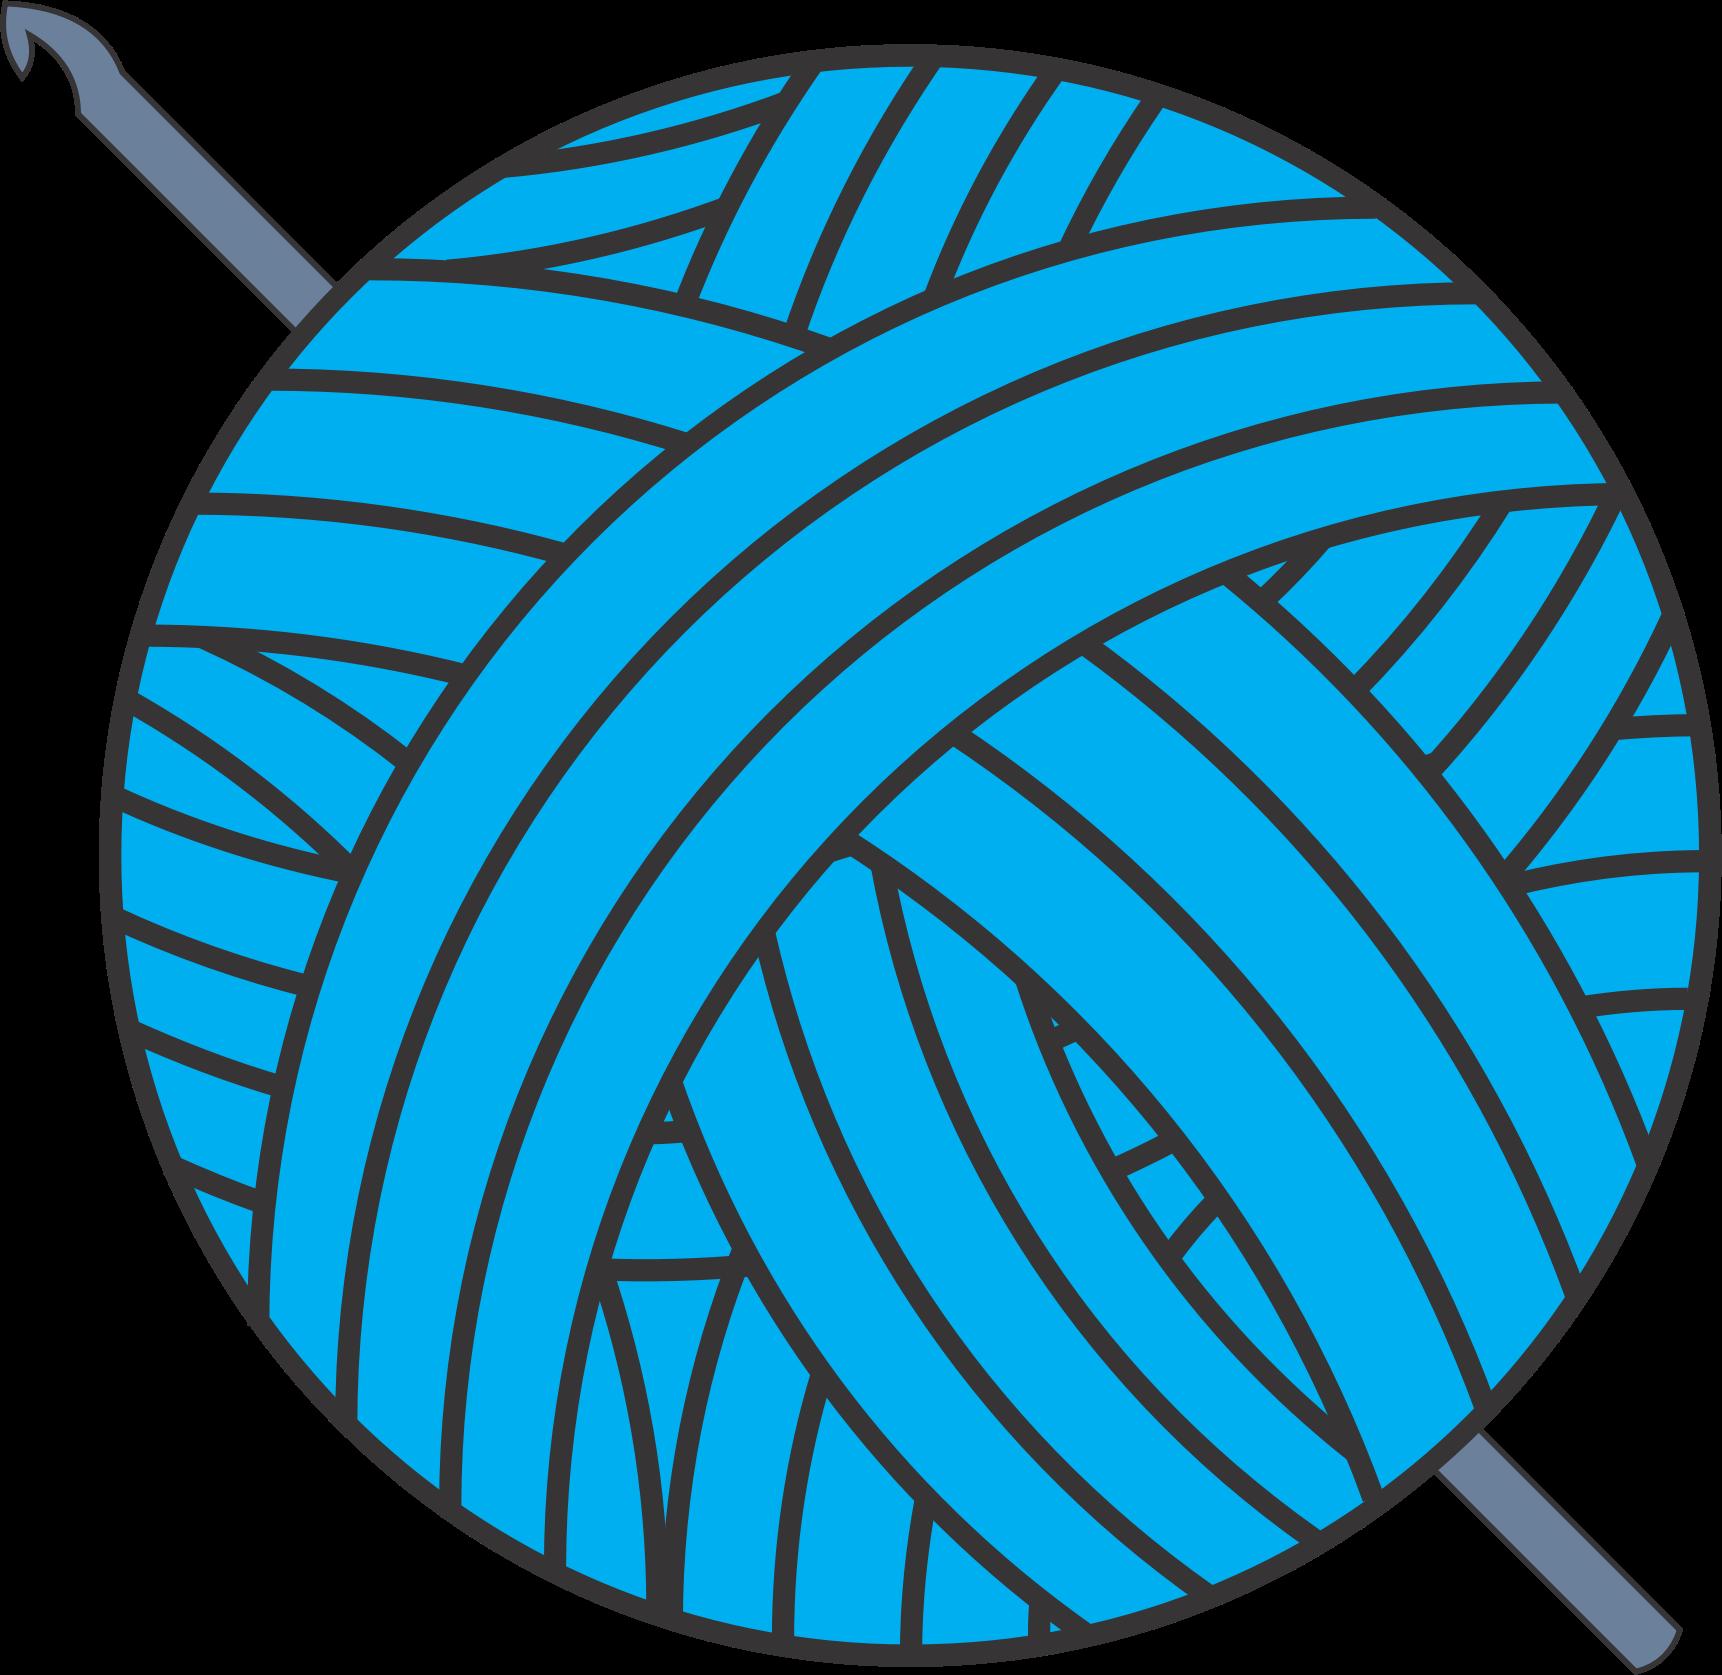 Clip Art Ball Of Yarn Clipart Clipground - Clip Art Yarn (1722x1675)